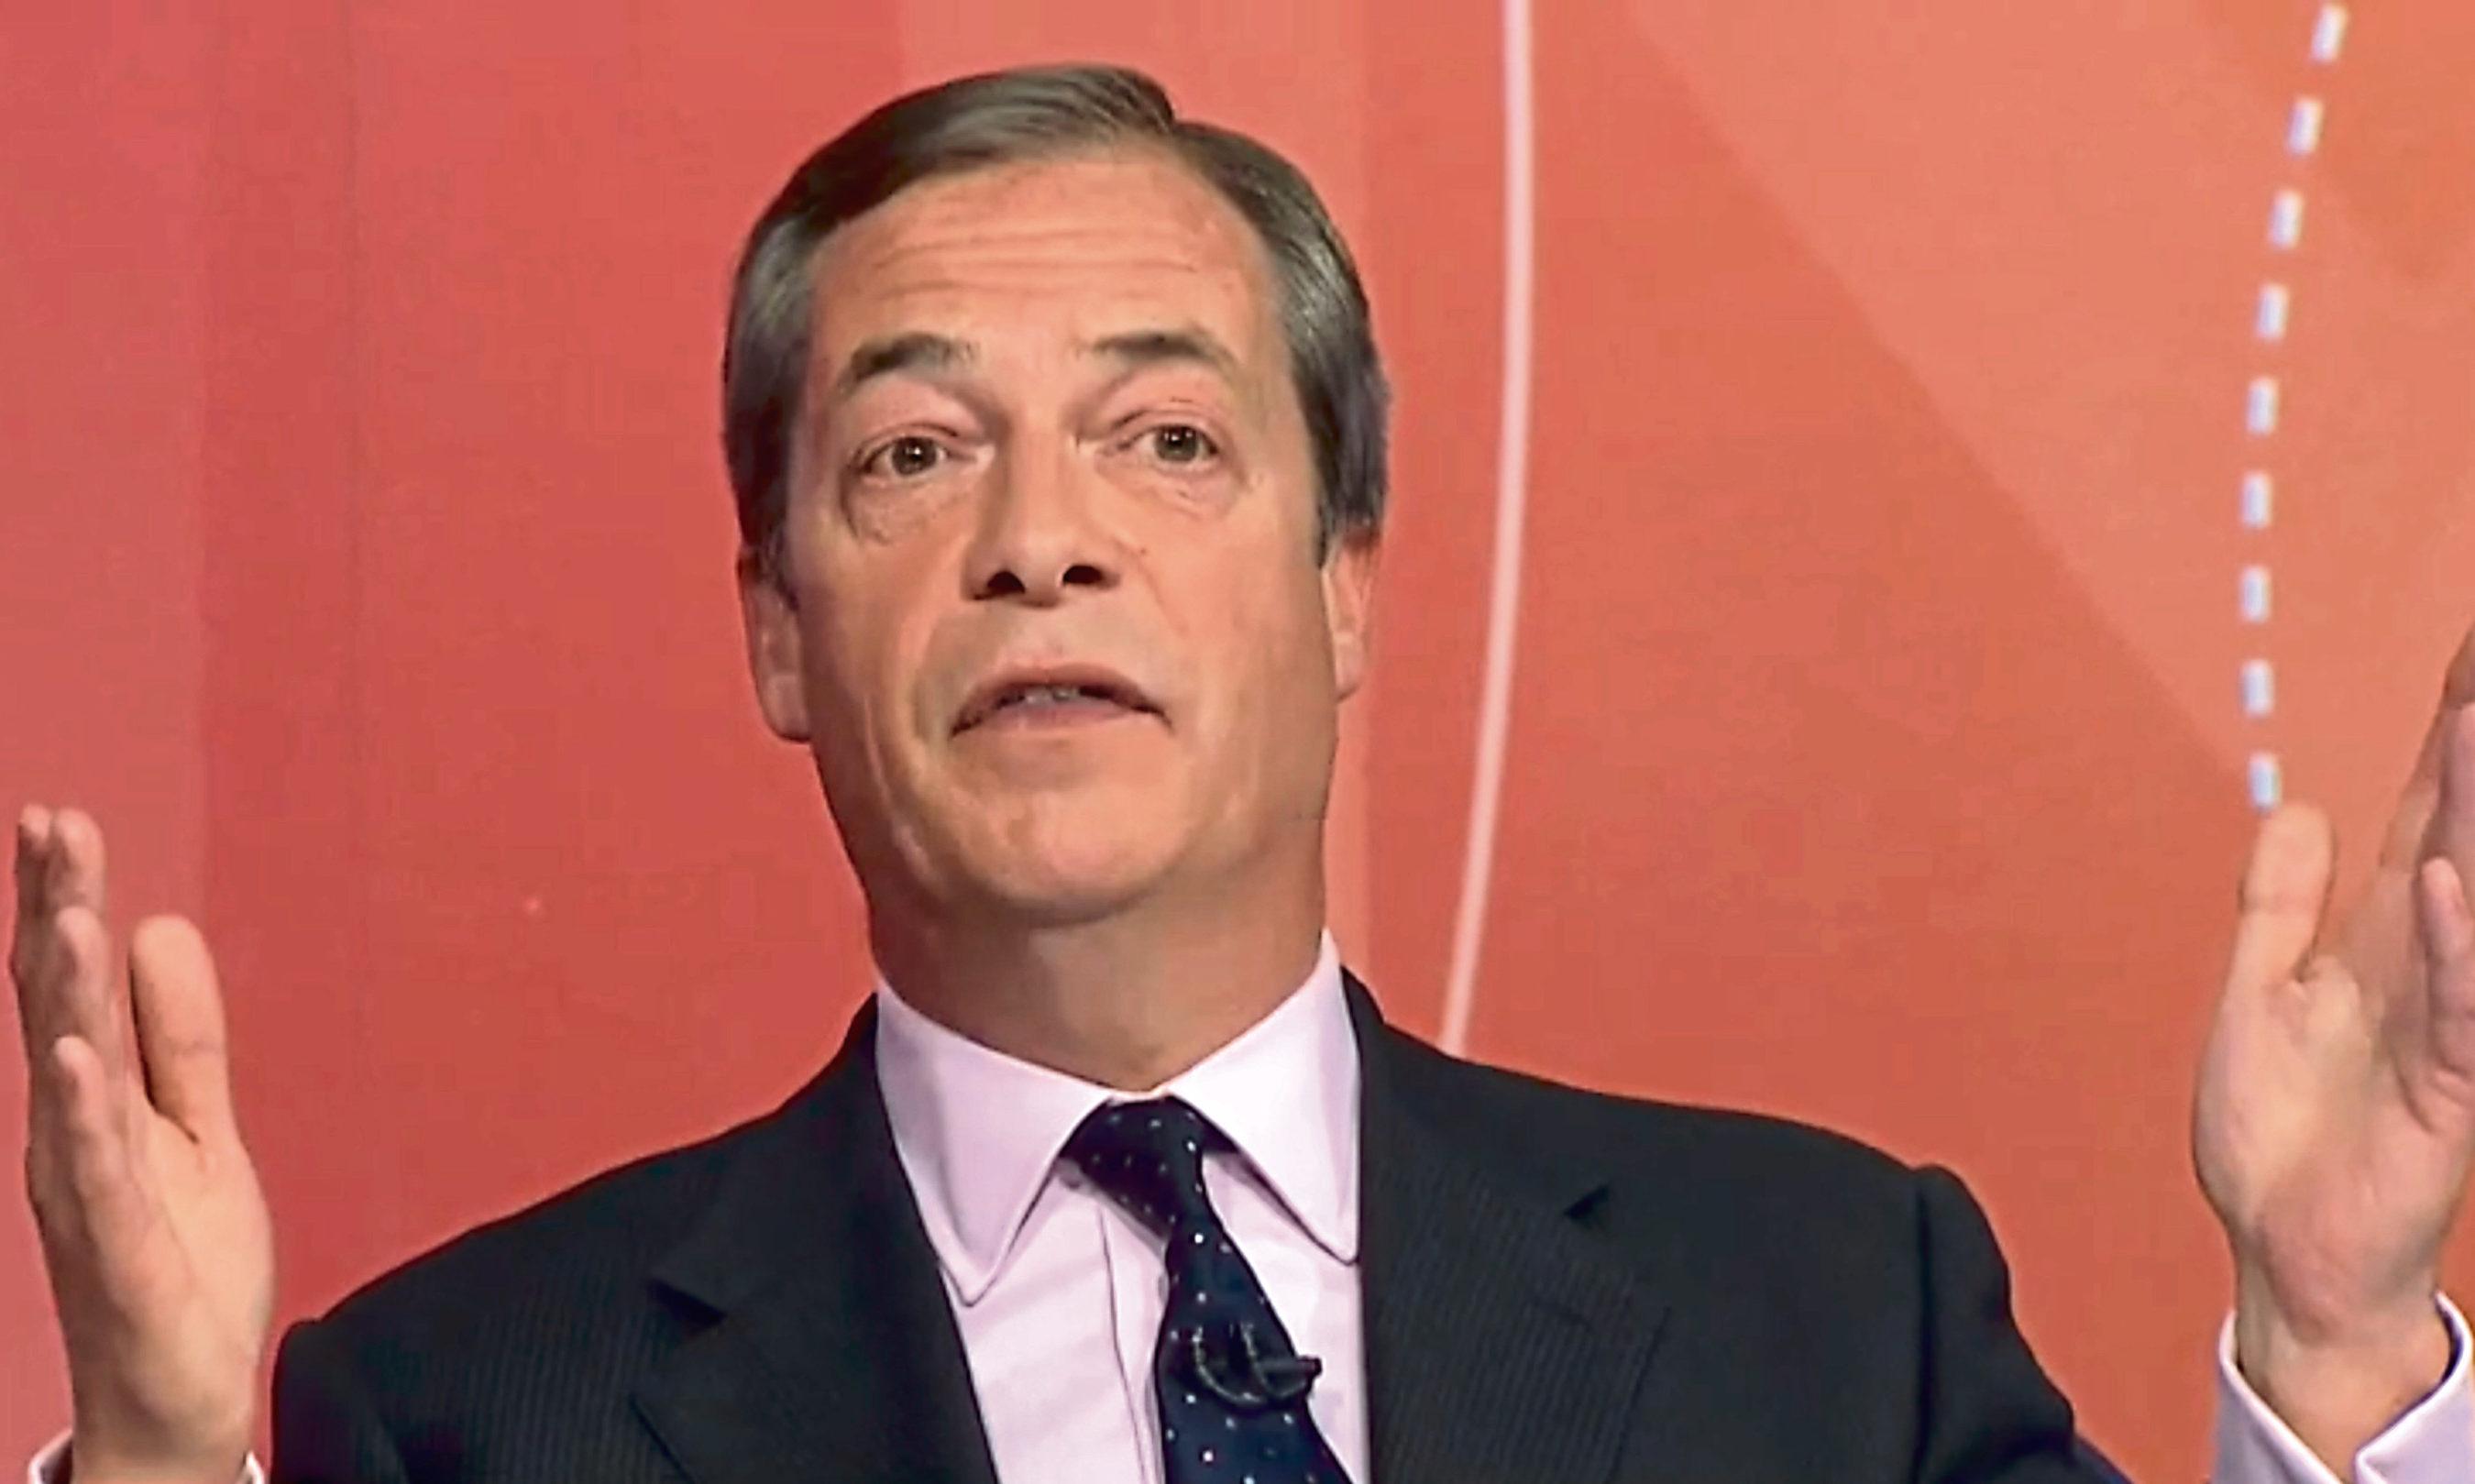 Nigel Farage on Question Time